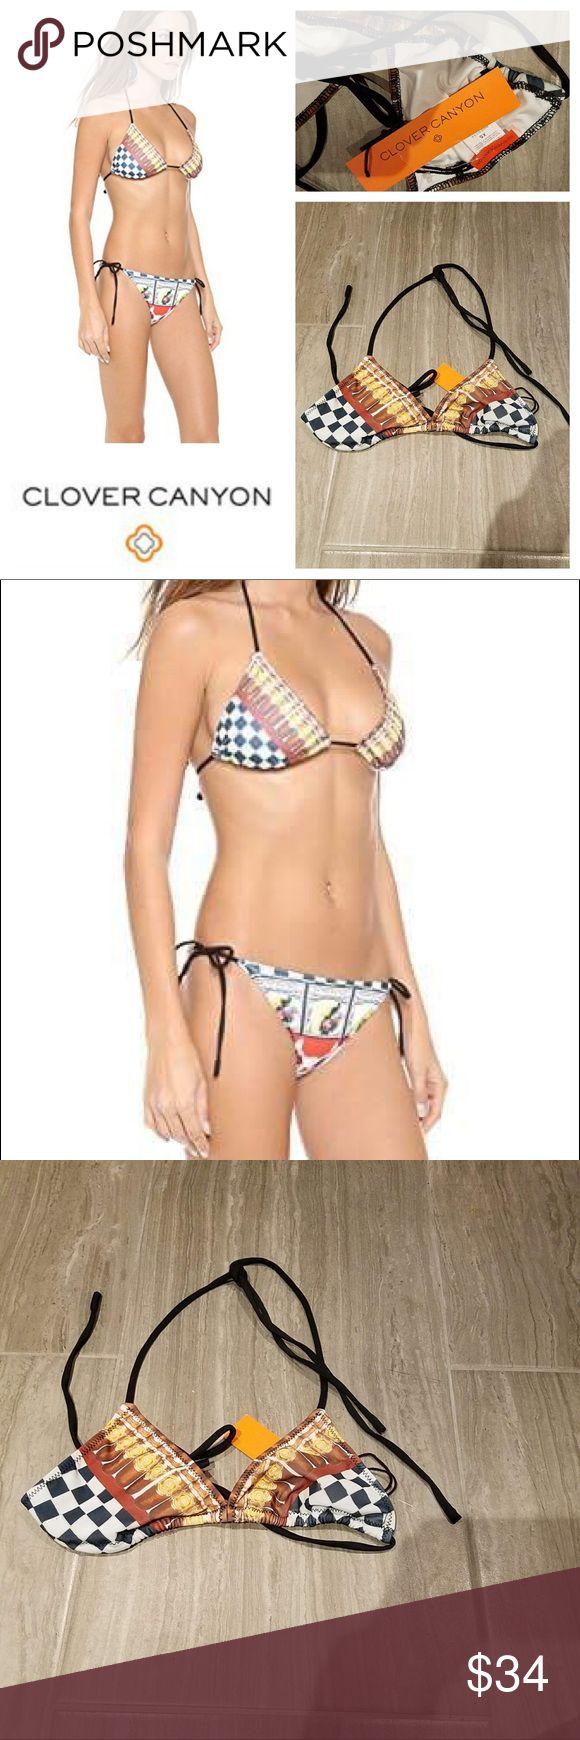 NWT $98 CLOVER CANYON CUBAN Cigar Bikini Top Brand New with Tags. Retails for $98. Size XS Clover Canyon Swim Bikinis